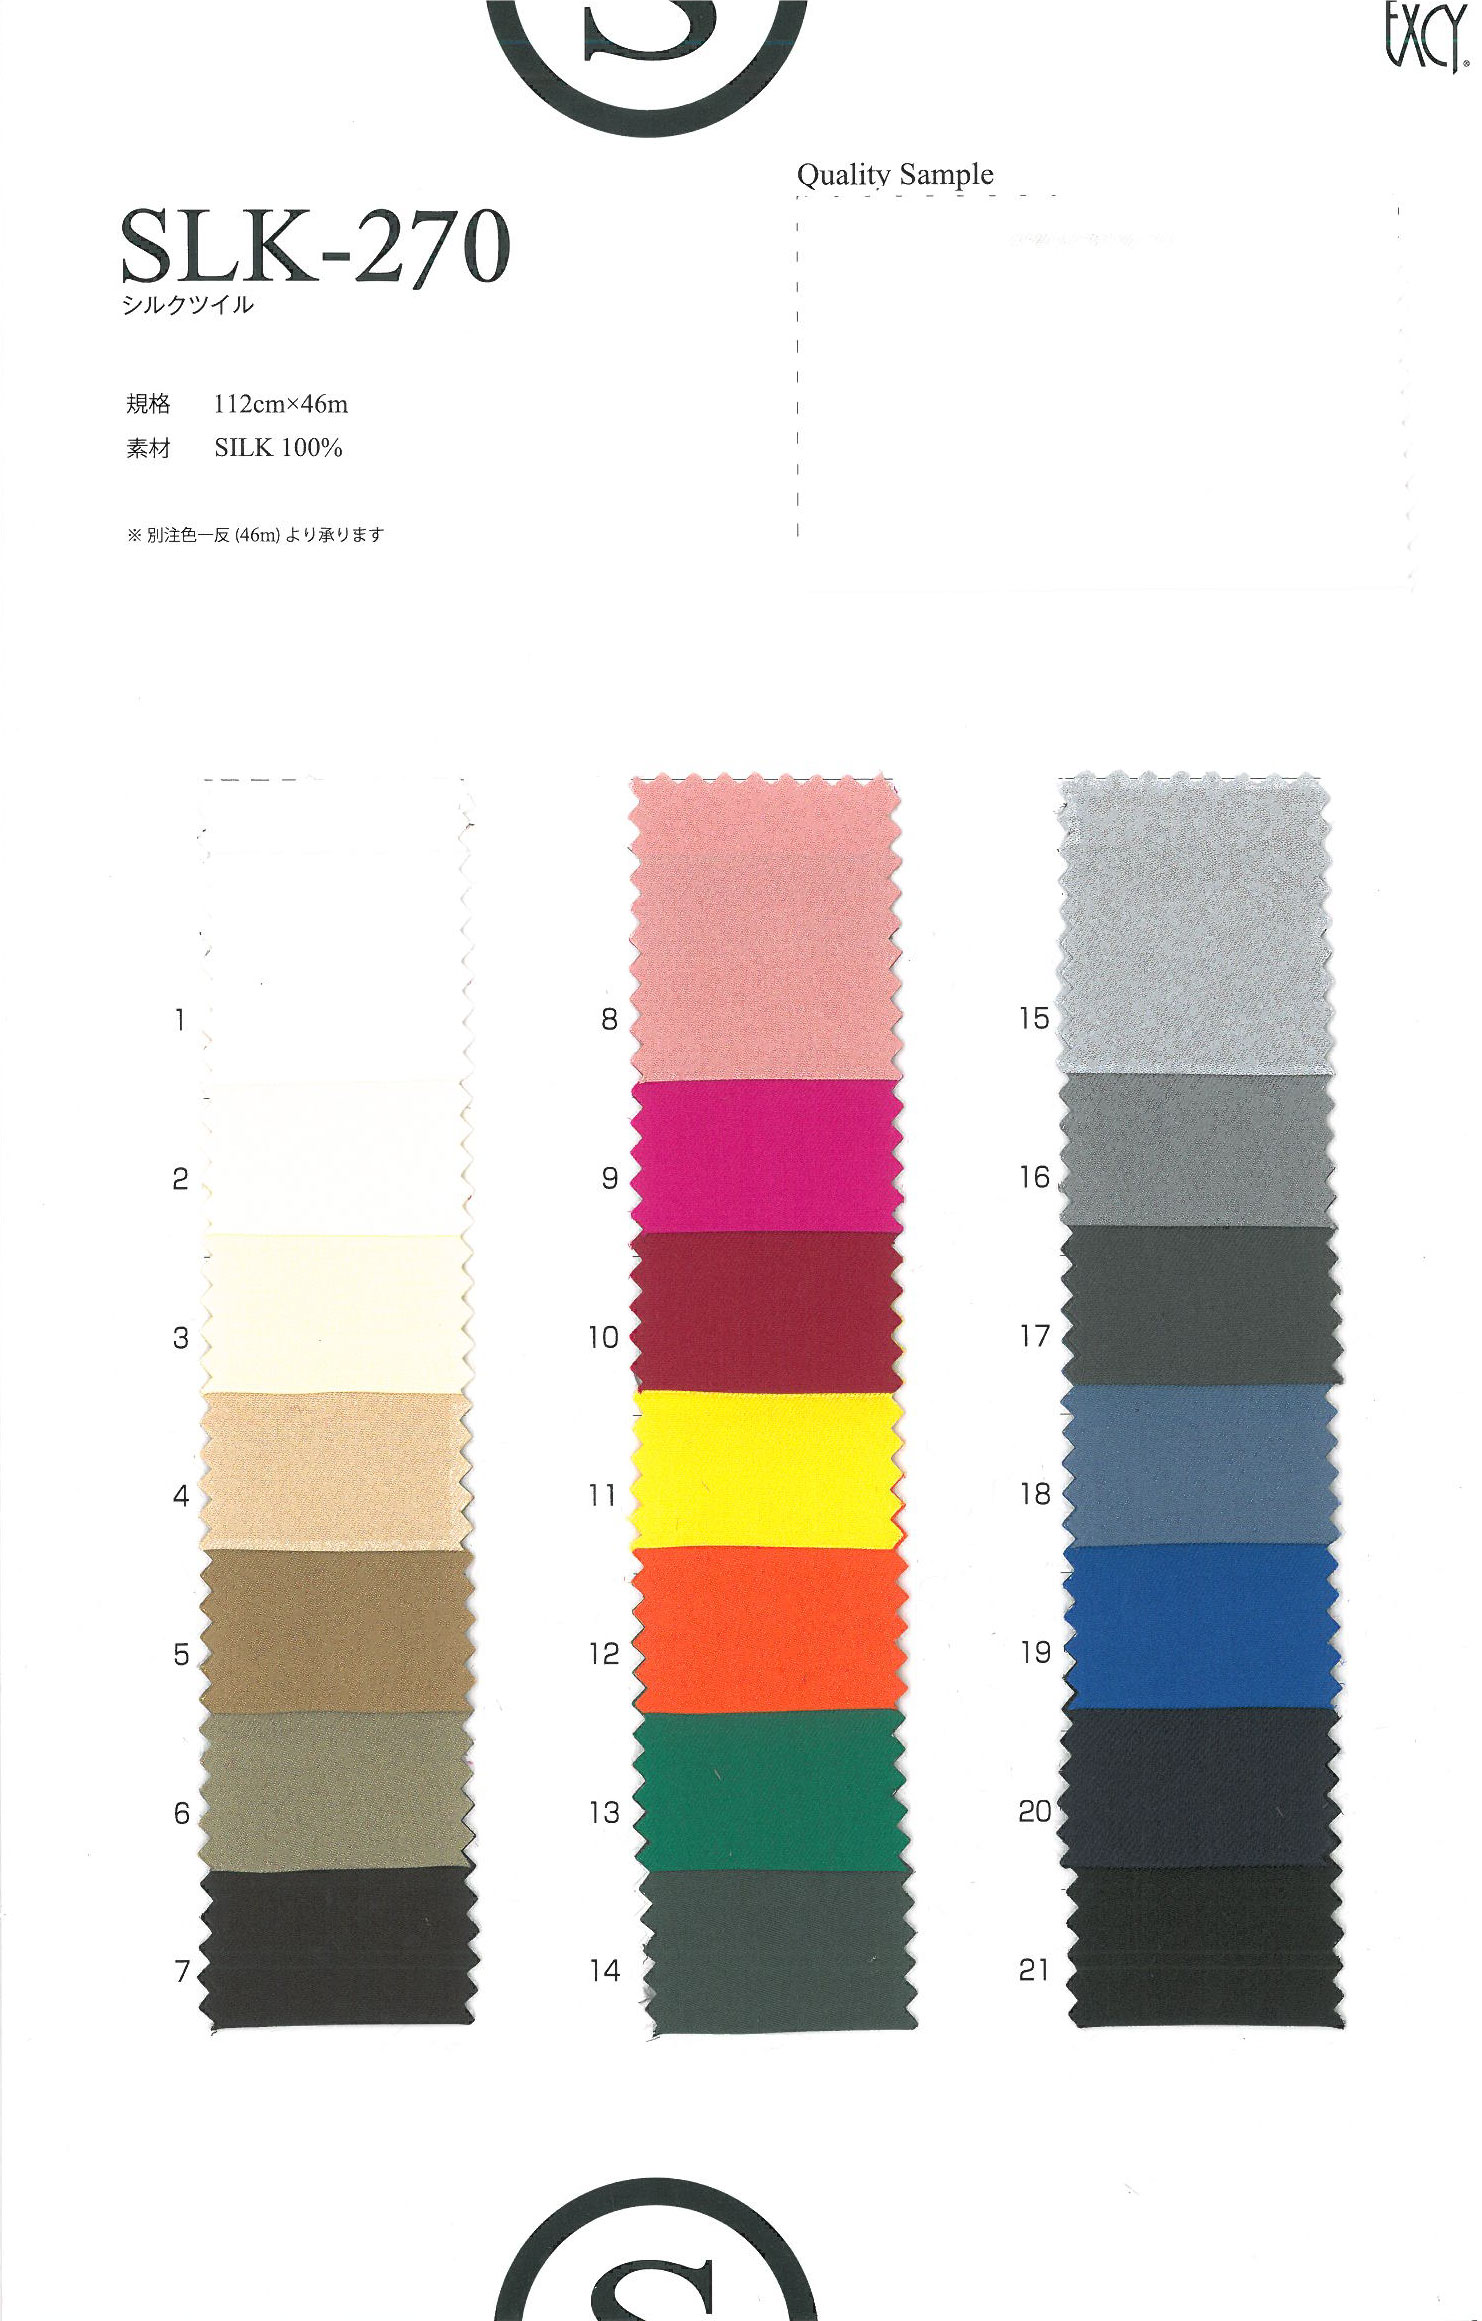 SLK270 本絹ツイル 16匁[生地] オークラ商事 - ApparelX アパレル資材卸通販